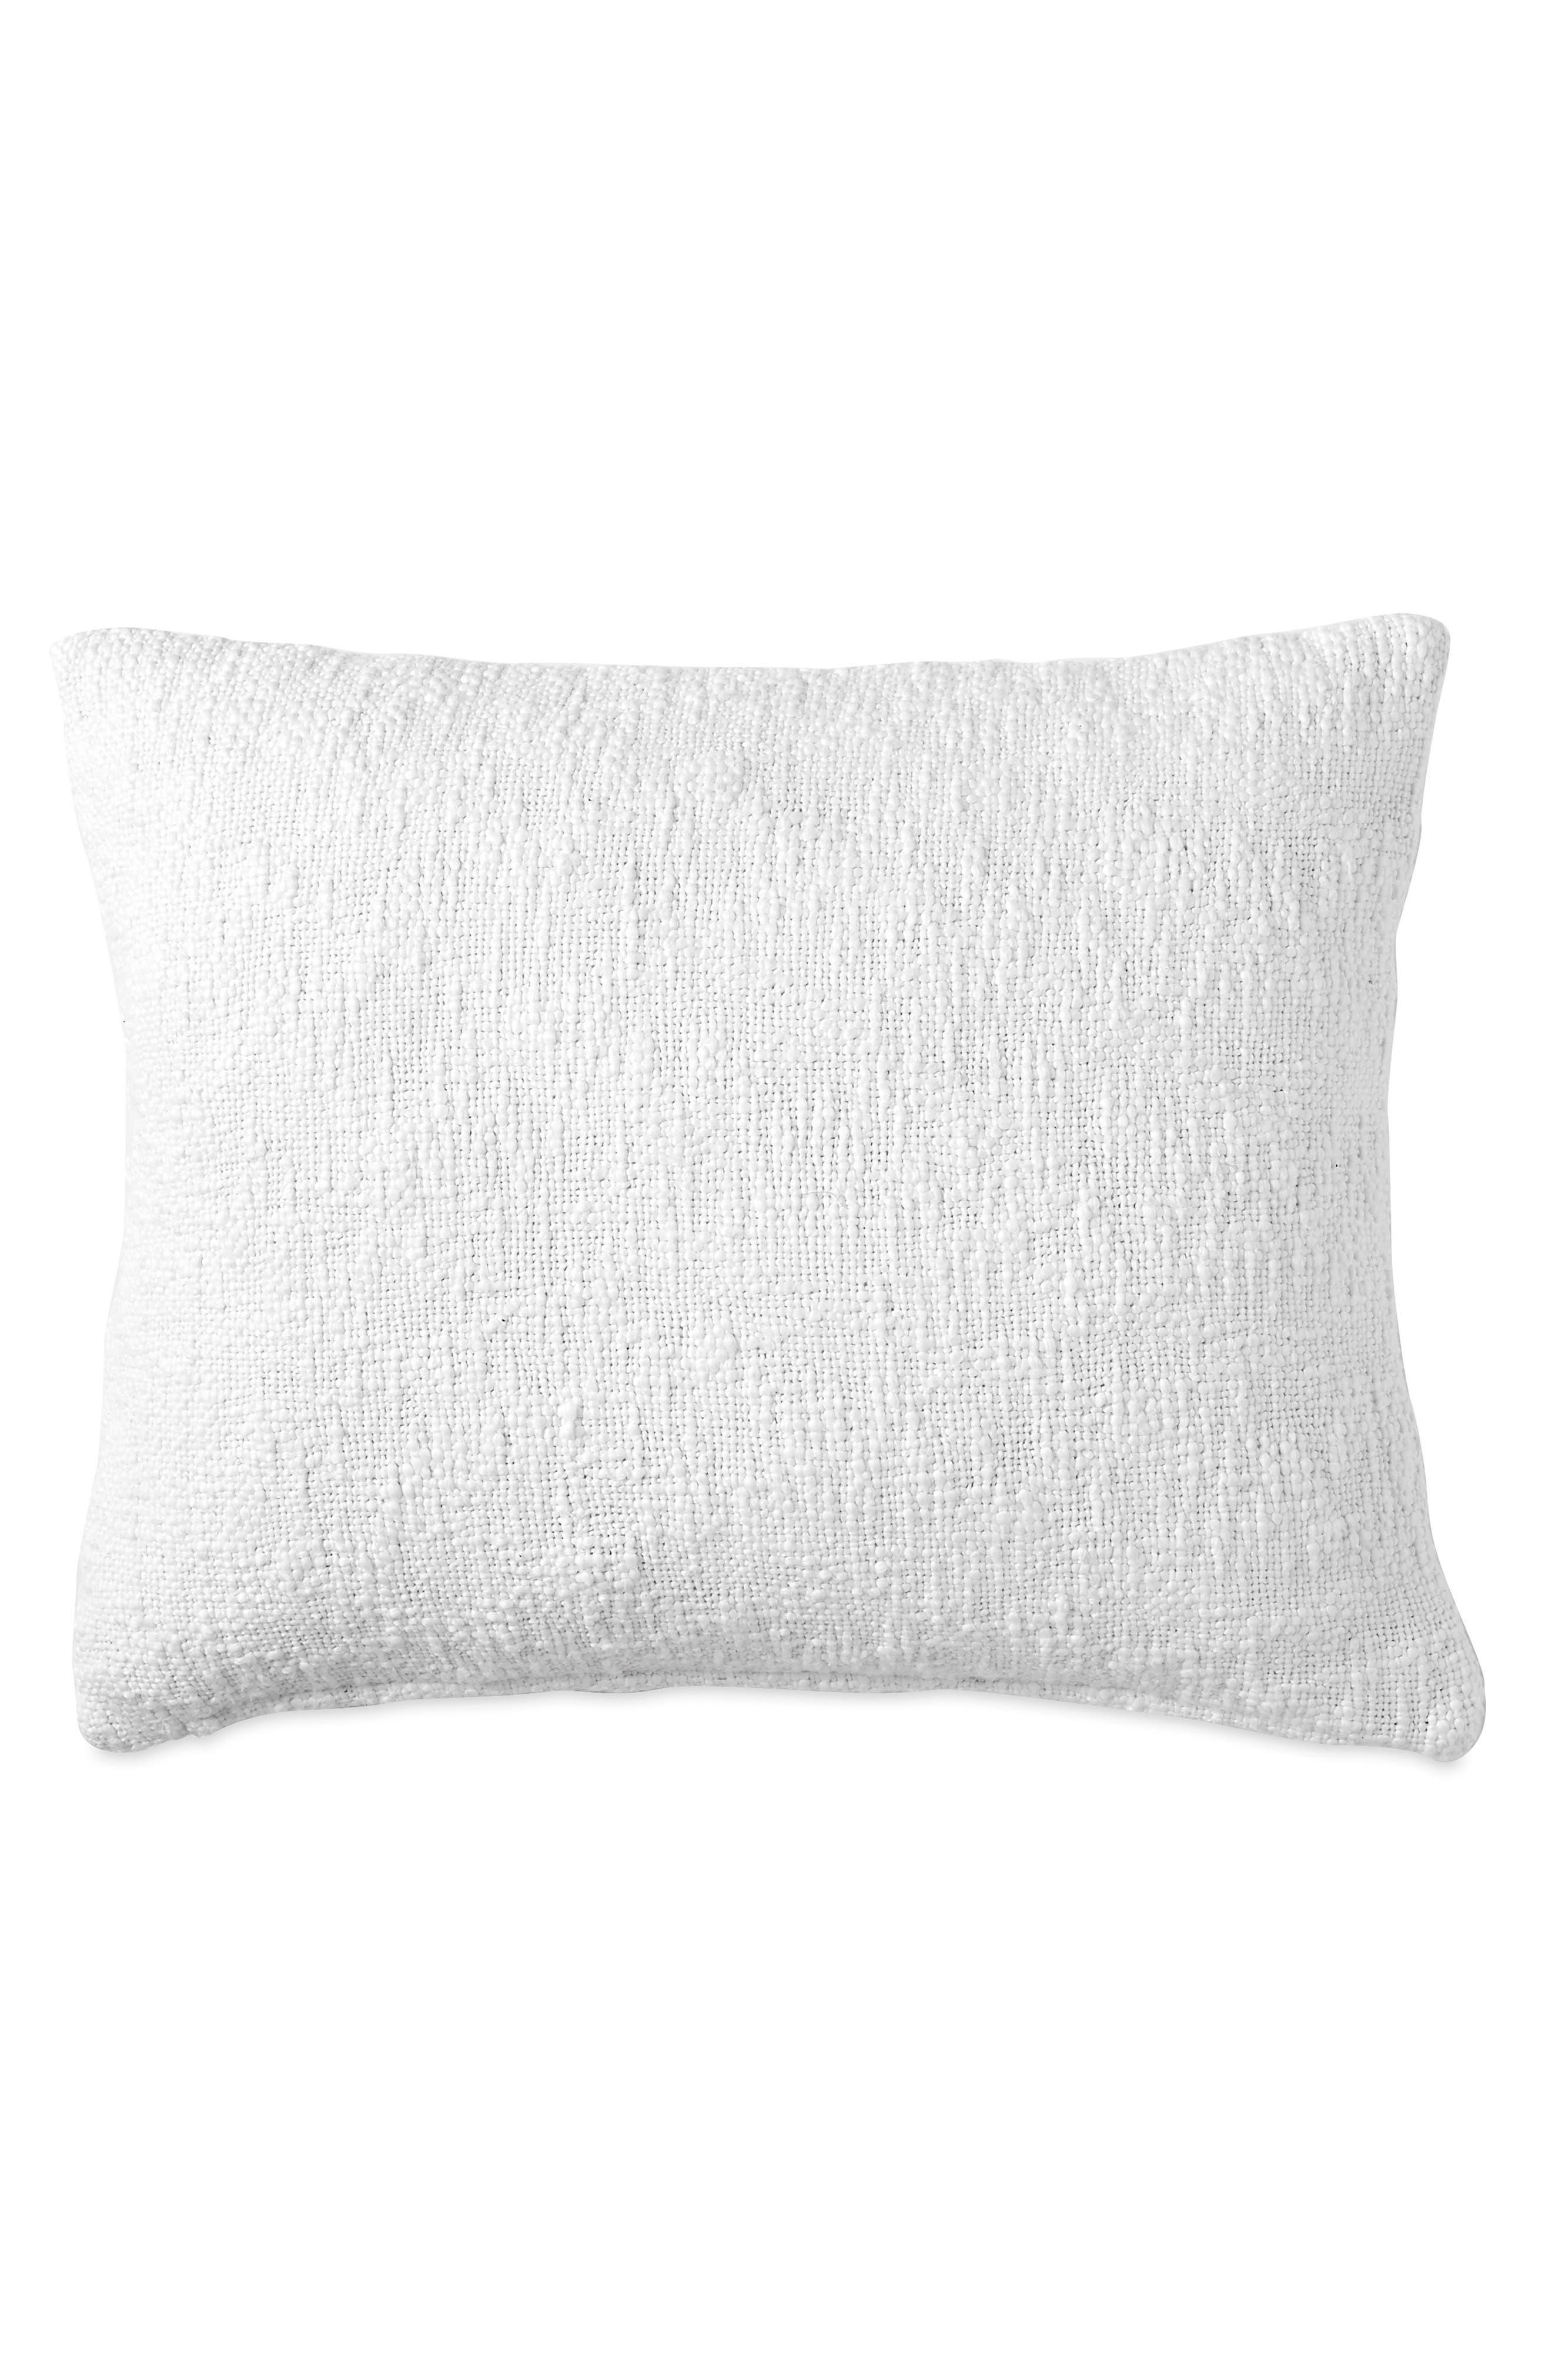 DKNY Textured Accent Pillow